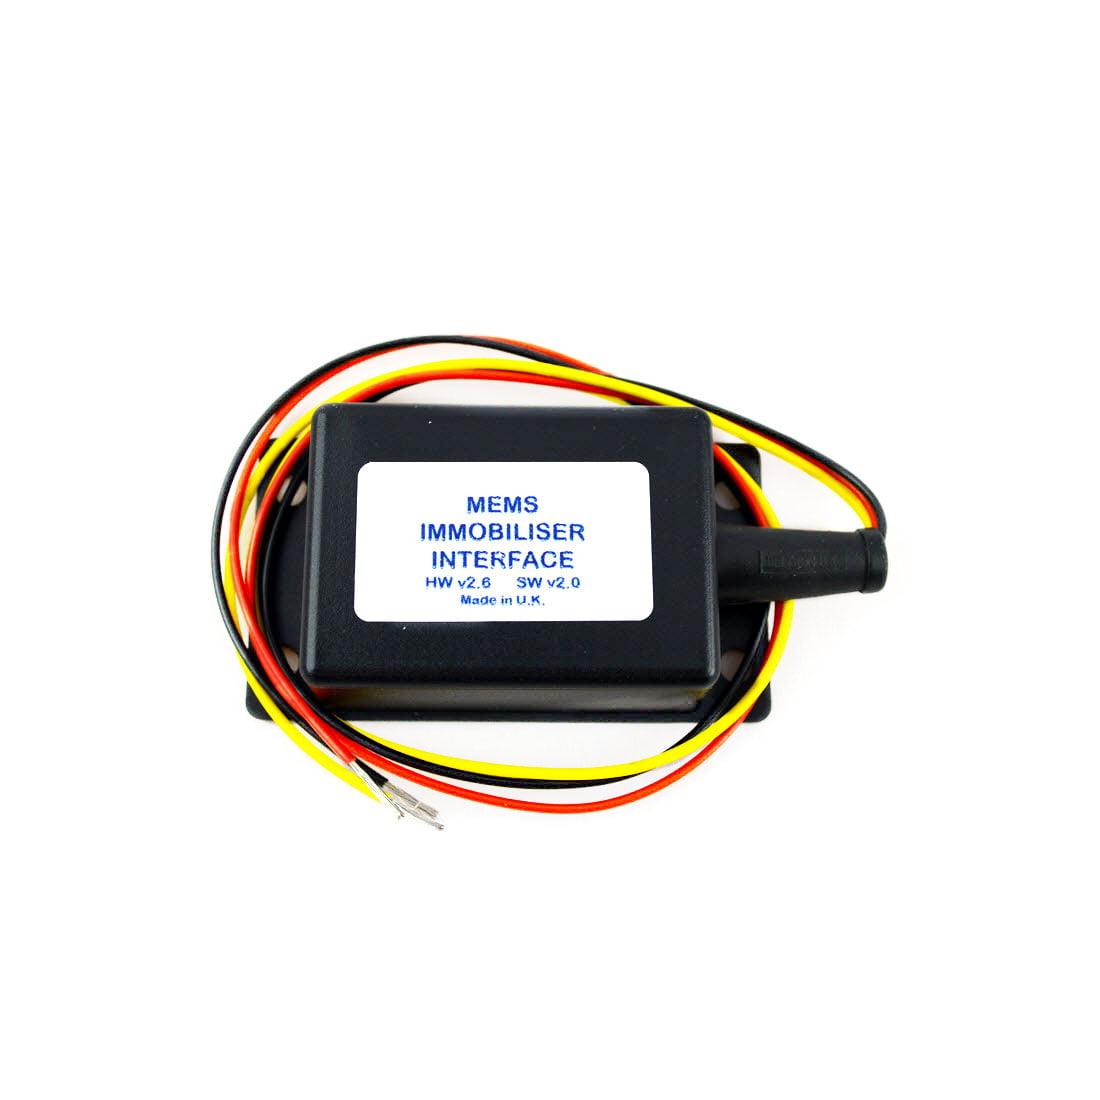 Rover, Landrover MEMS ECU Immobiliser Emulator